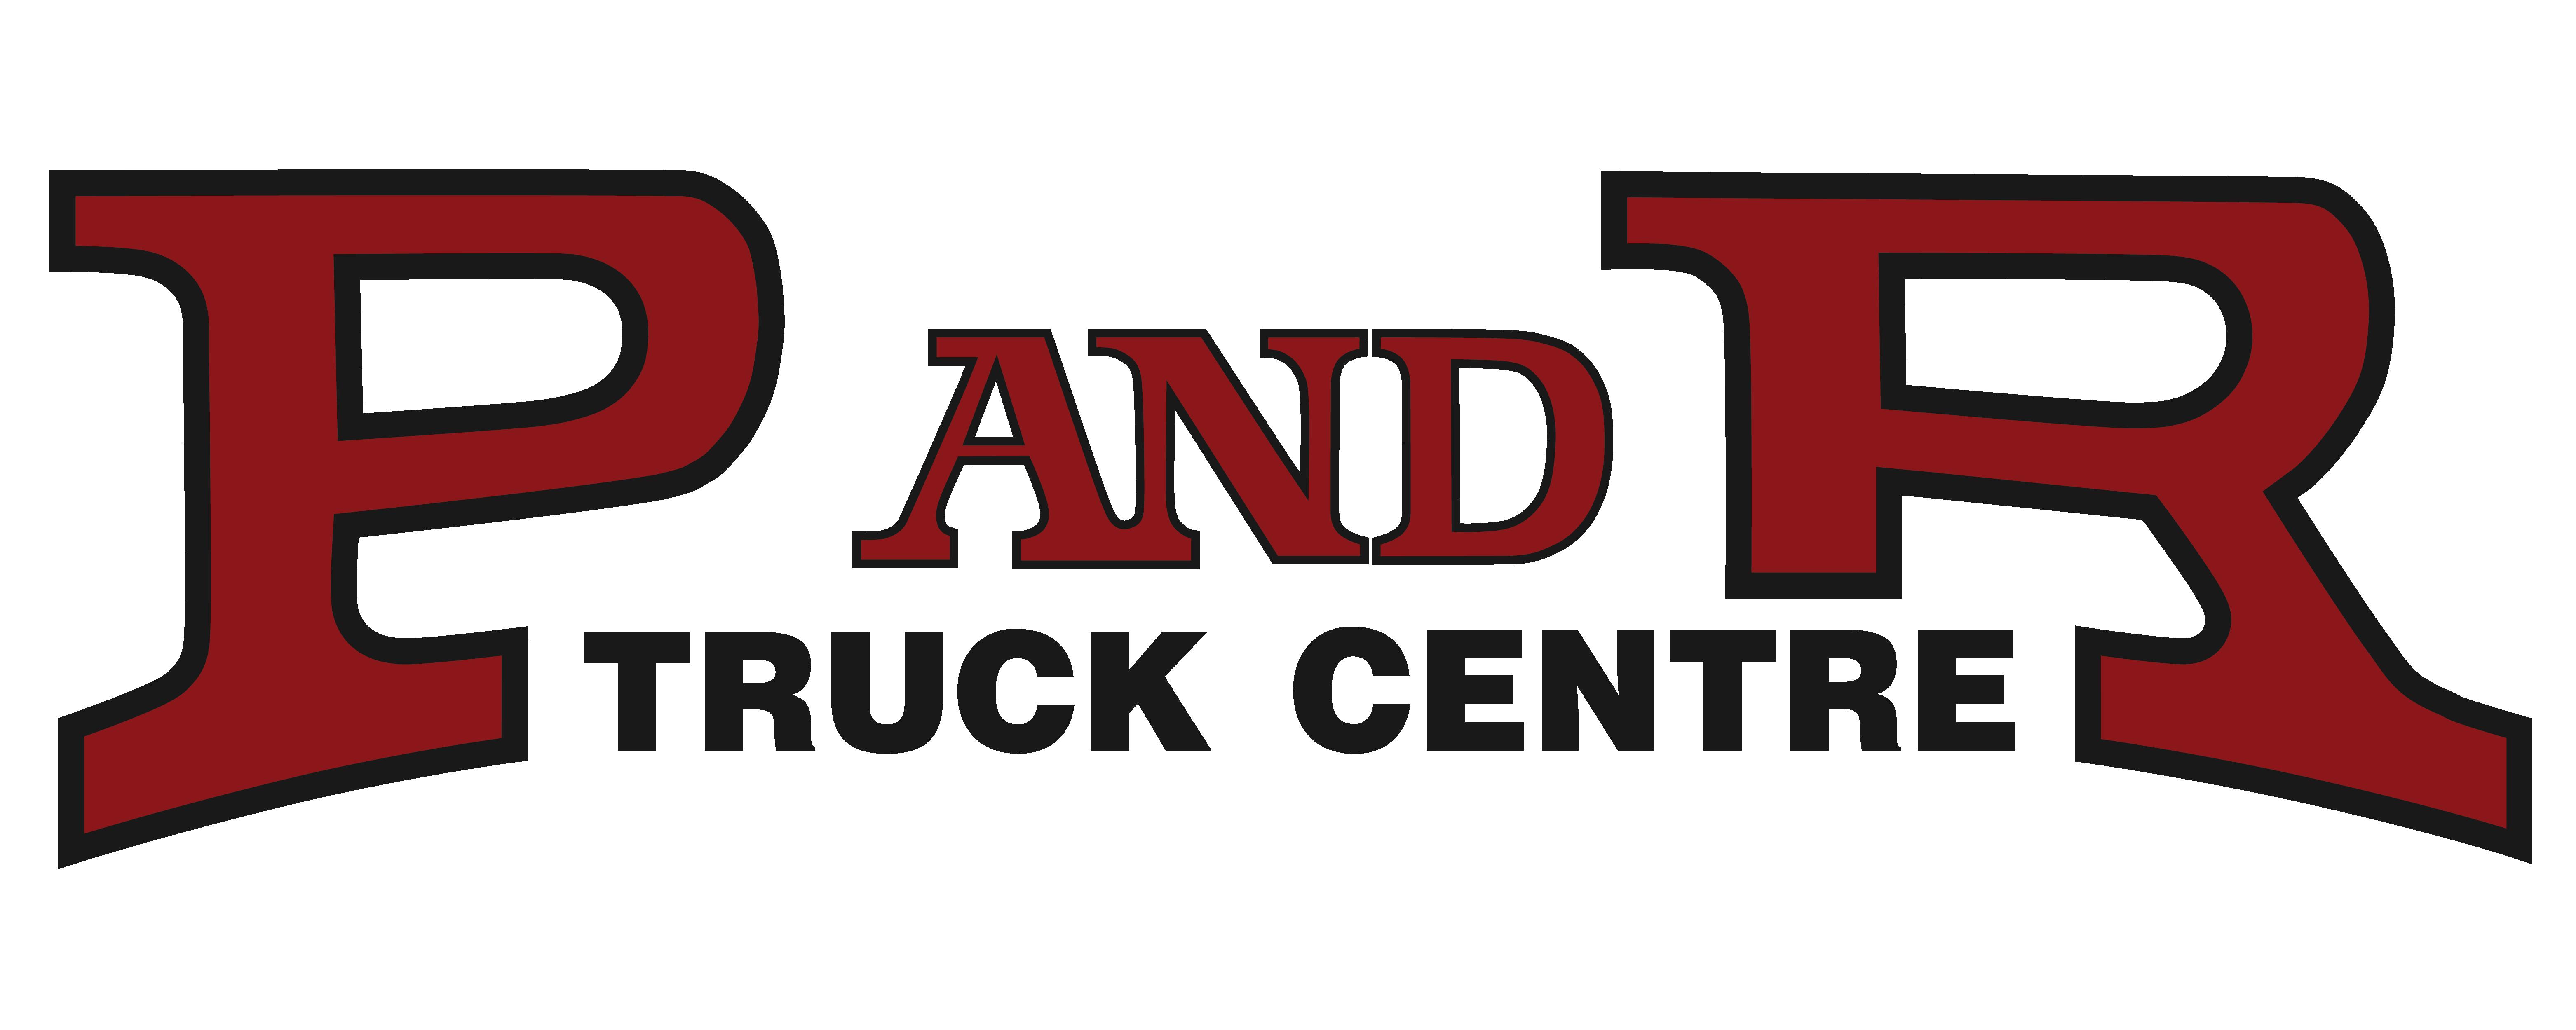 P&R Truck Centre Logo